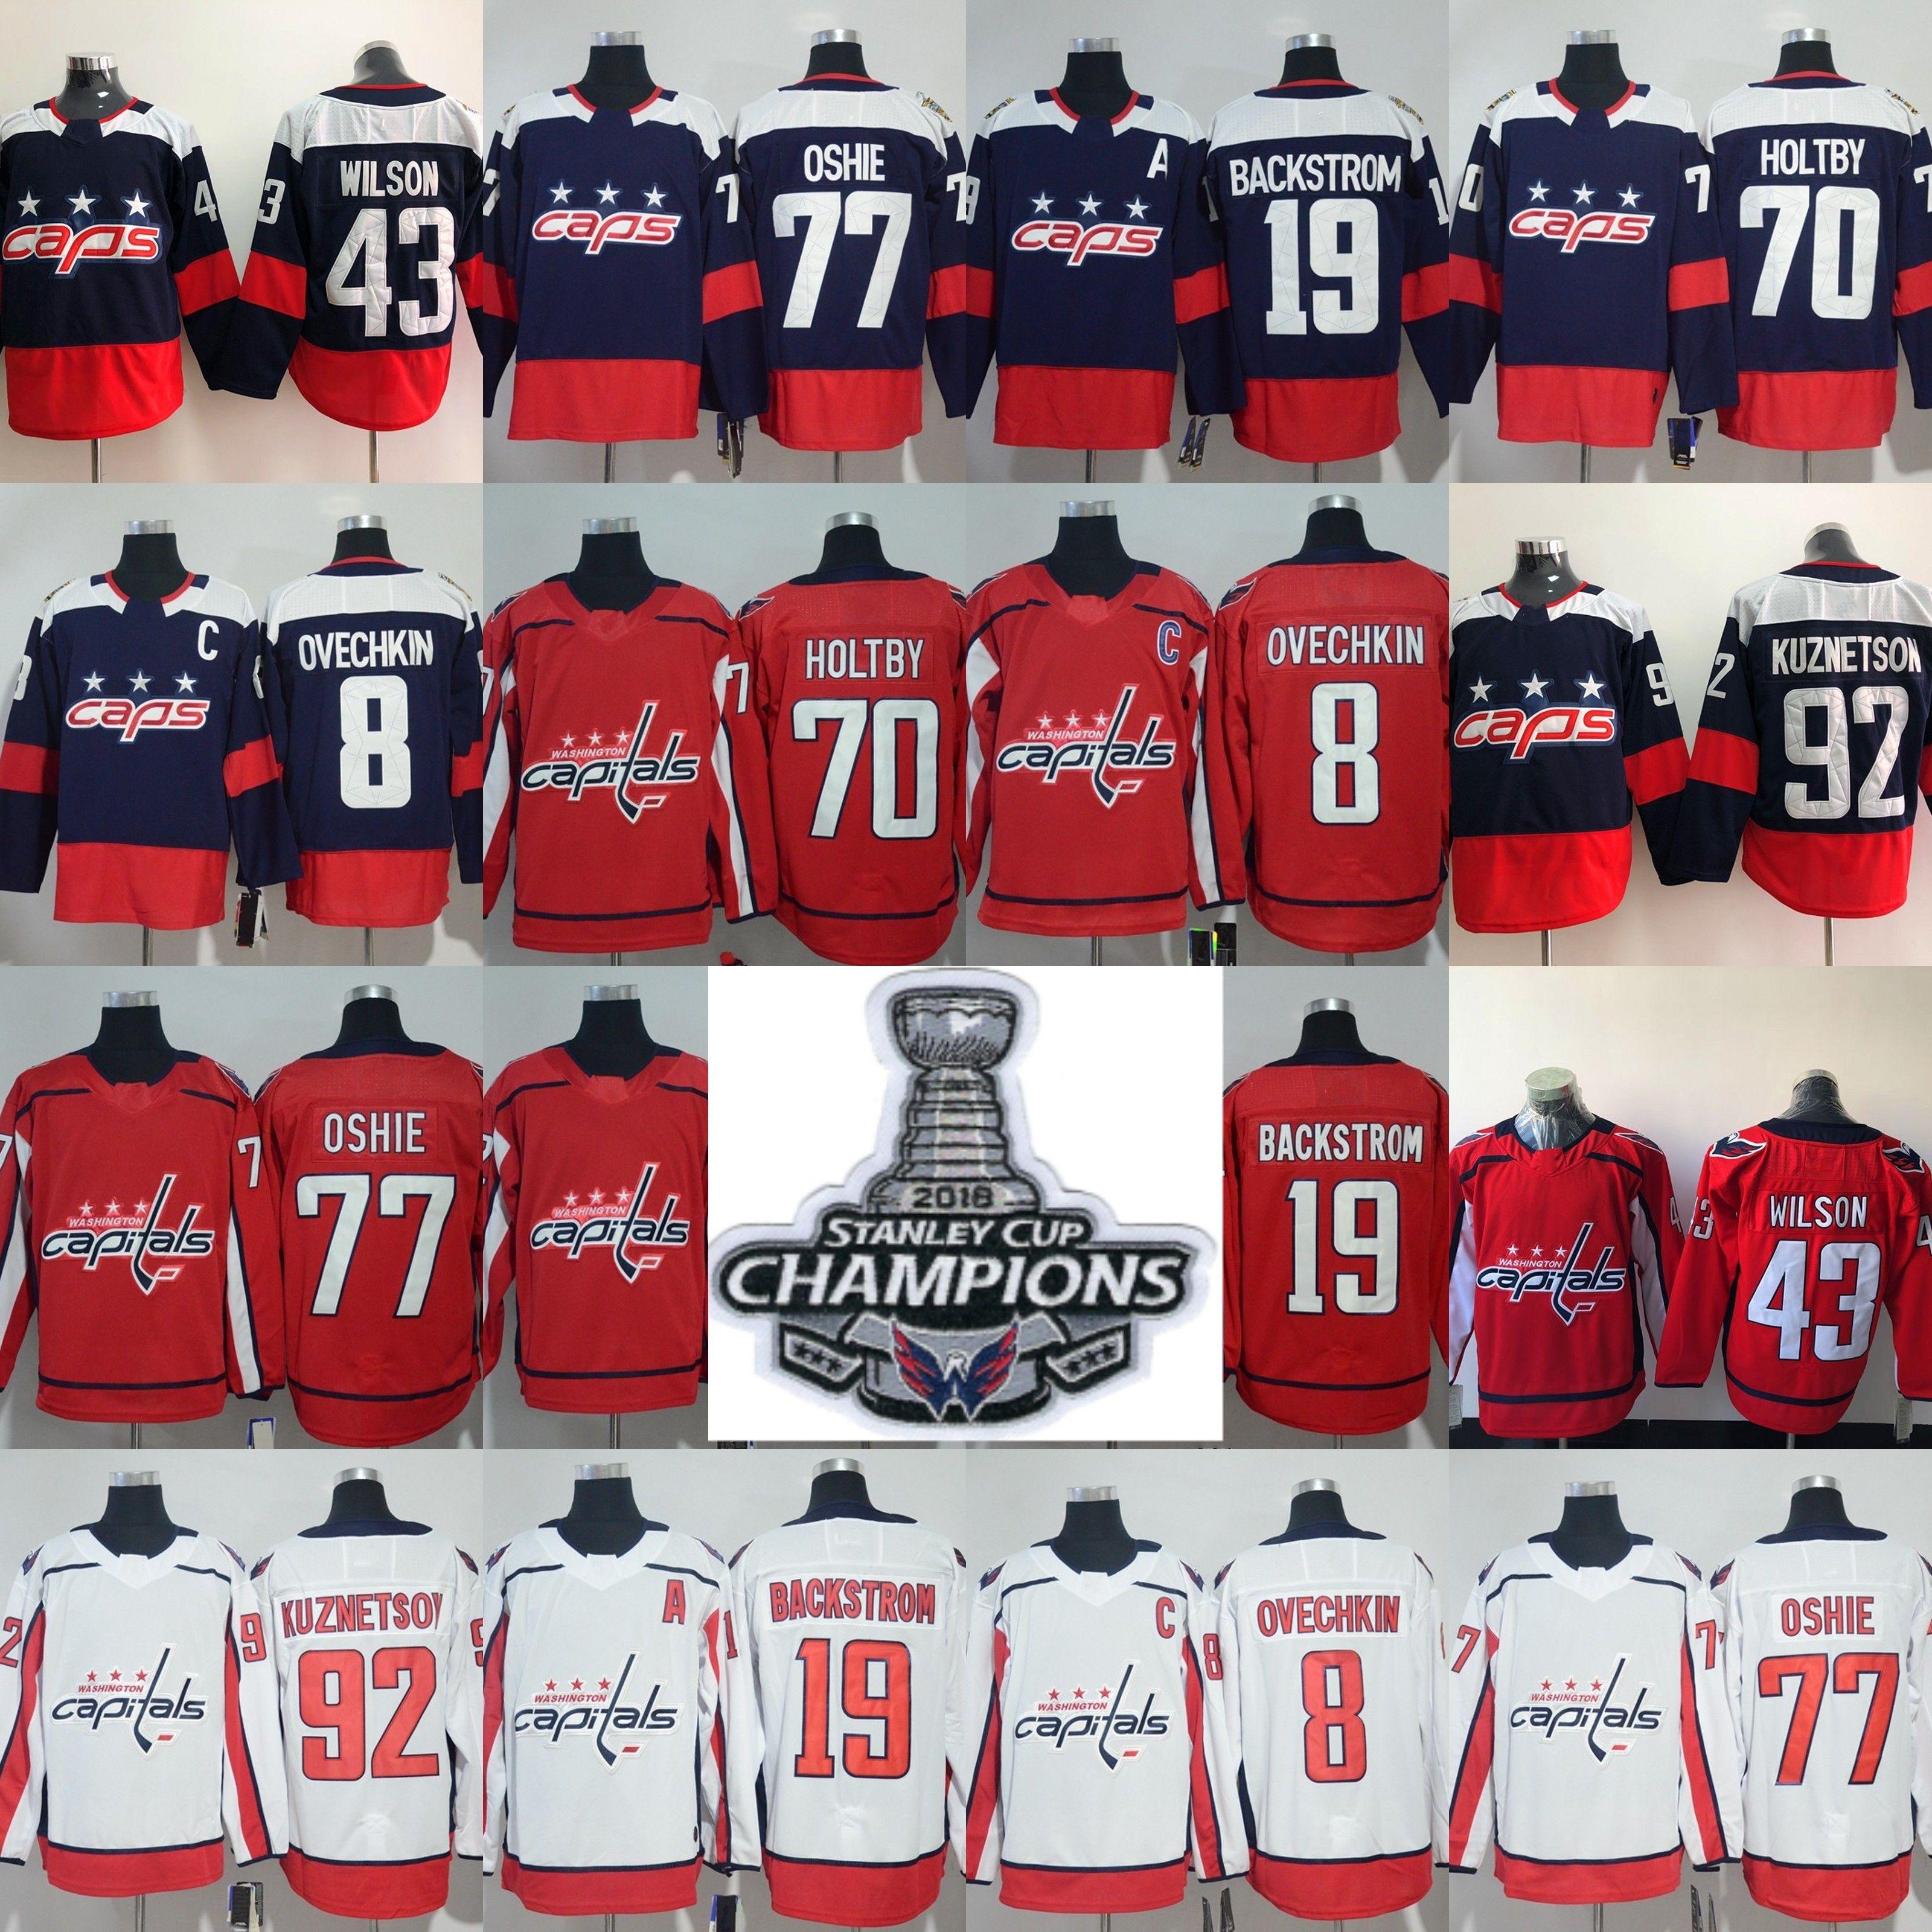 5c33ab905 2019 2018 Stanley Cup Champions Washington Capitals 8 Alex Ovechkin 77 TJ  Oshie 70 Braden Holtby 92 Evgeny Kuznetsov Nicklas Backstrom Jersey From  Jersey ...